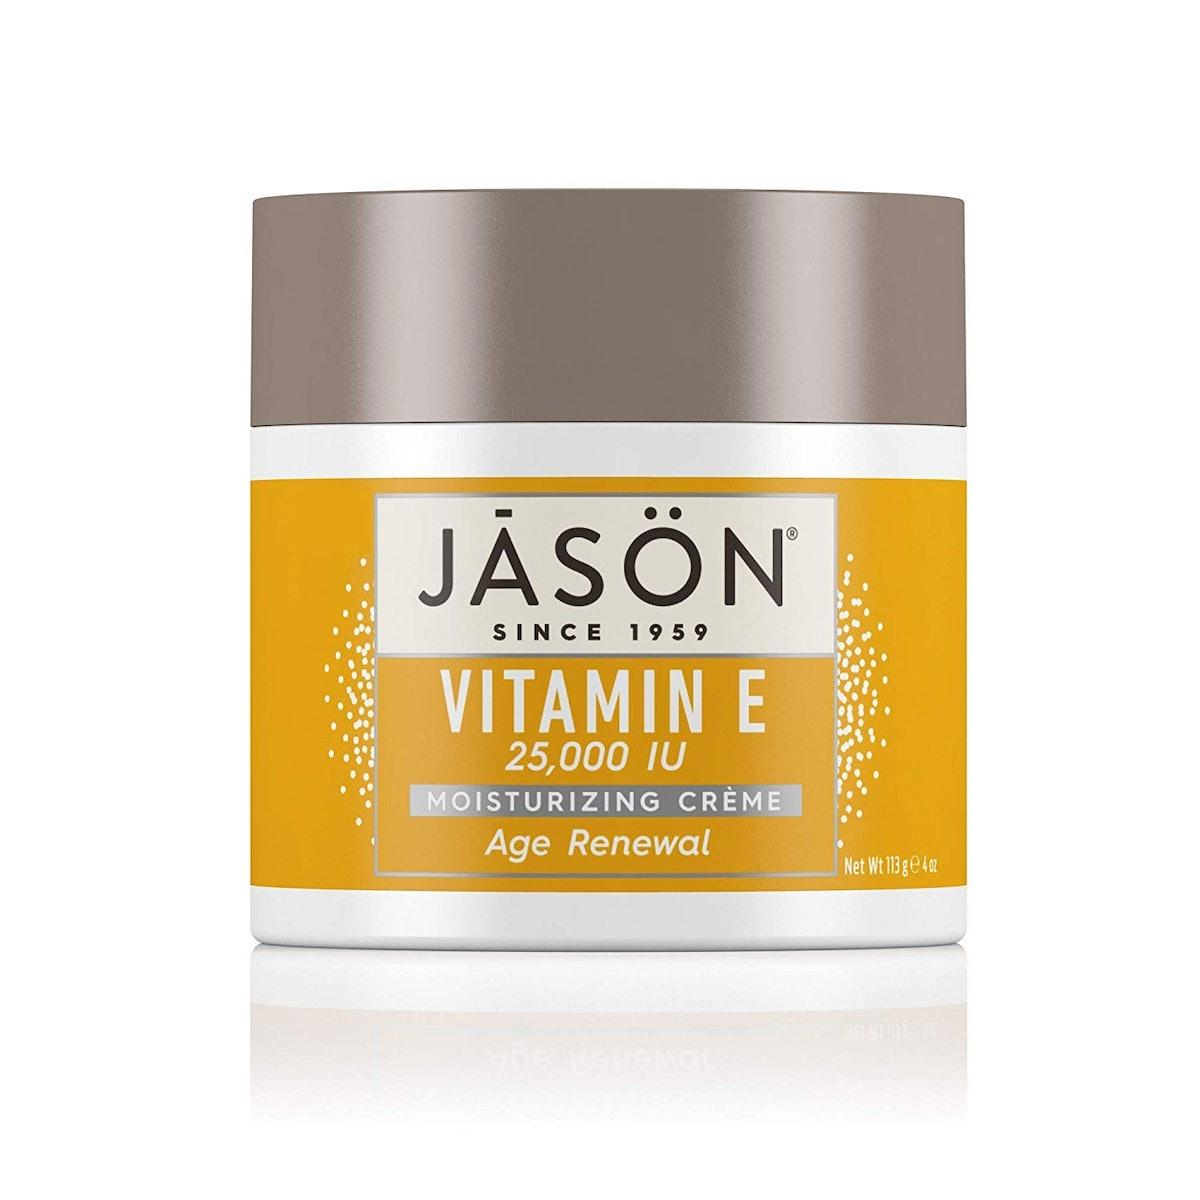 JASON Age Renewal Vitamin E 25,000 IU Moisturizing Crème